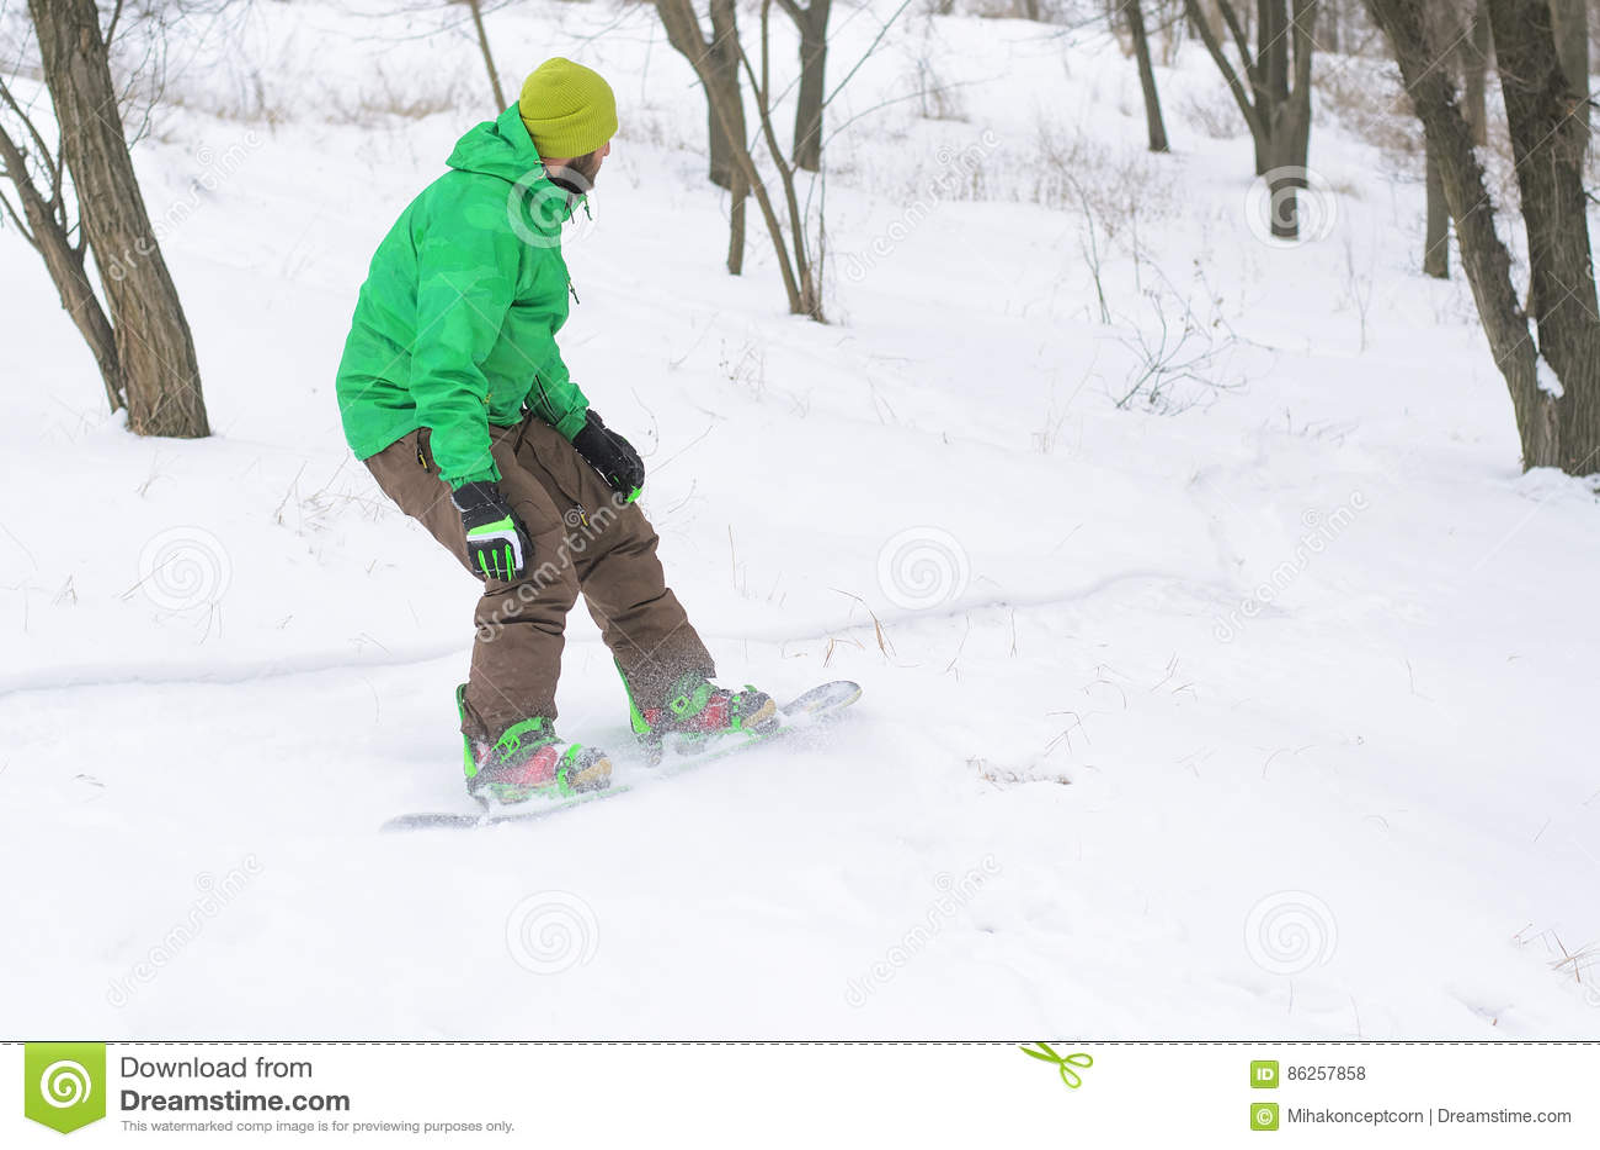 Active Man Snowboarding Stock Photo Image Of Travel 86257858